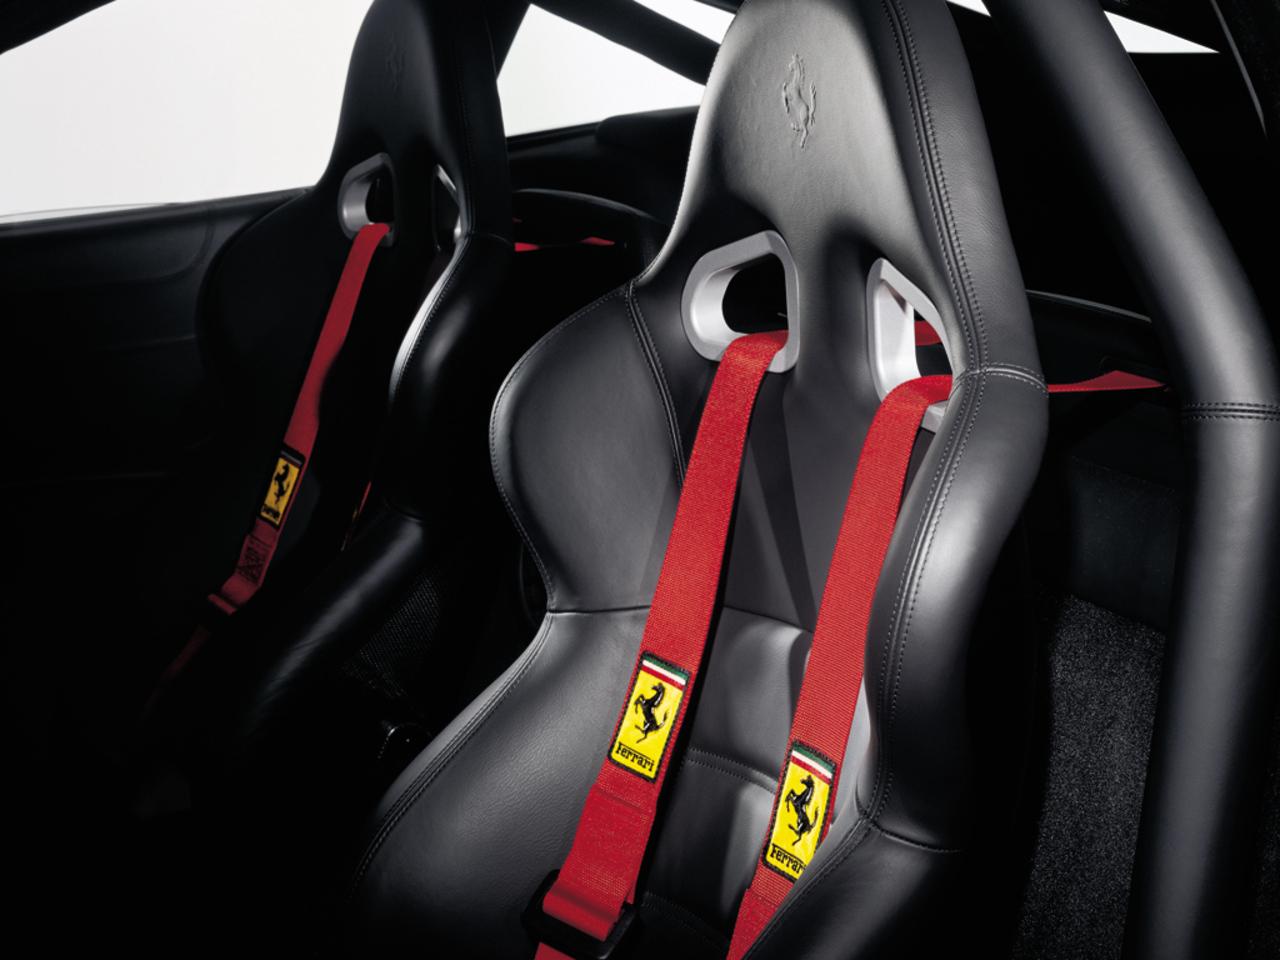 575M Maranello, seats detail